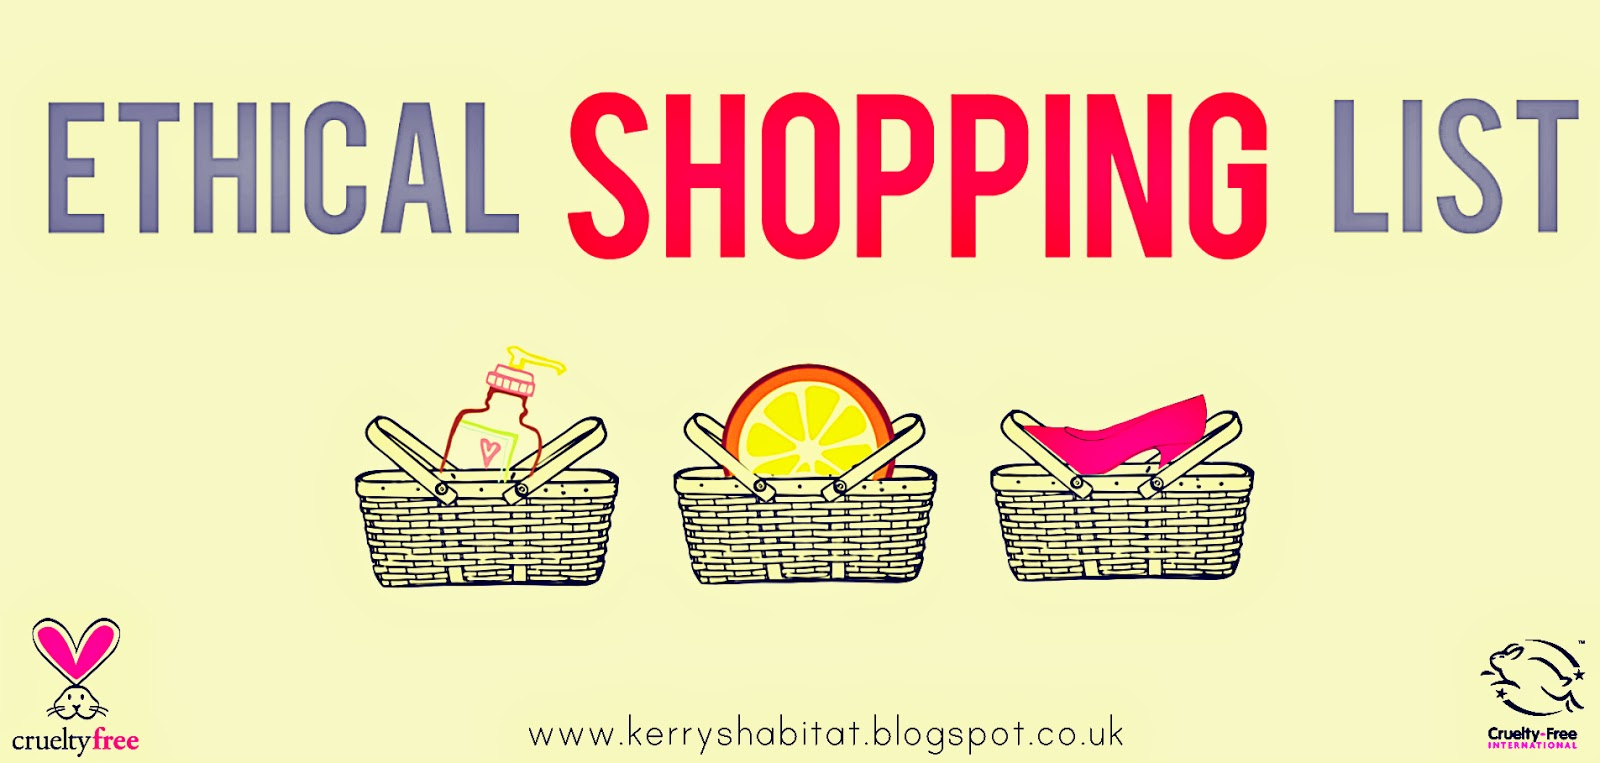 http://kerryshabitat.blogspot.co.uk/2014/09/afforable-ethical-shopping-list-uk.html